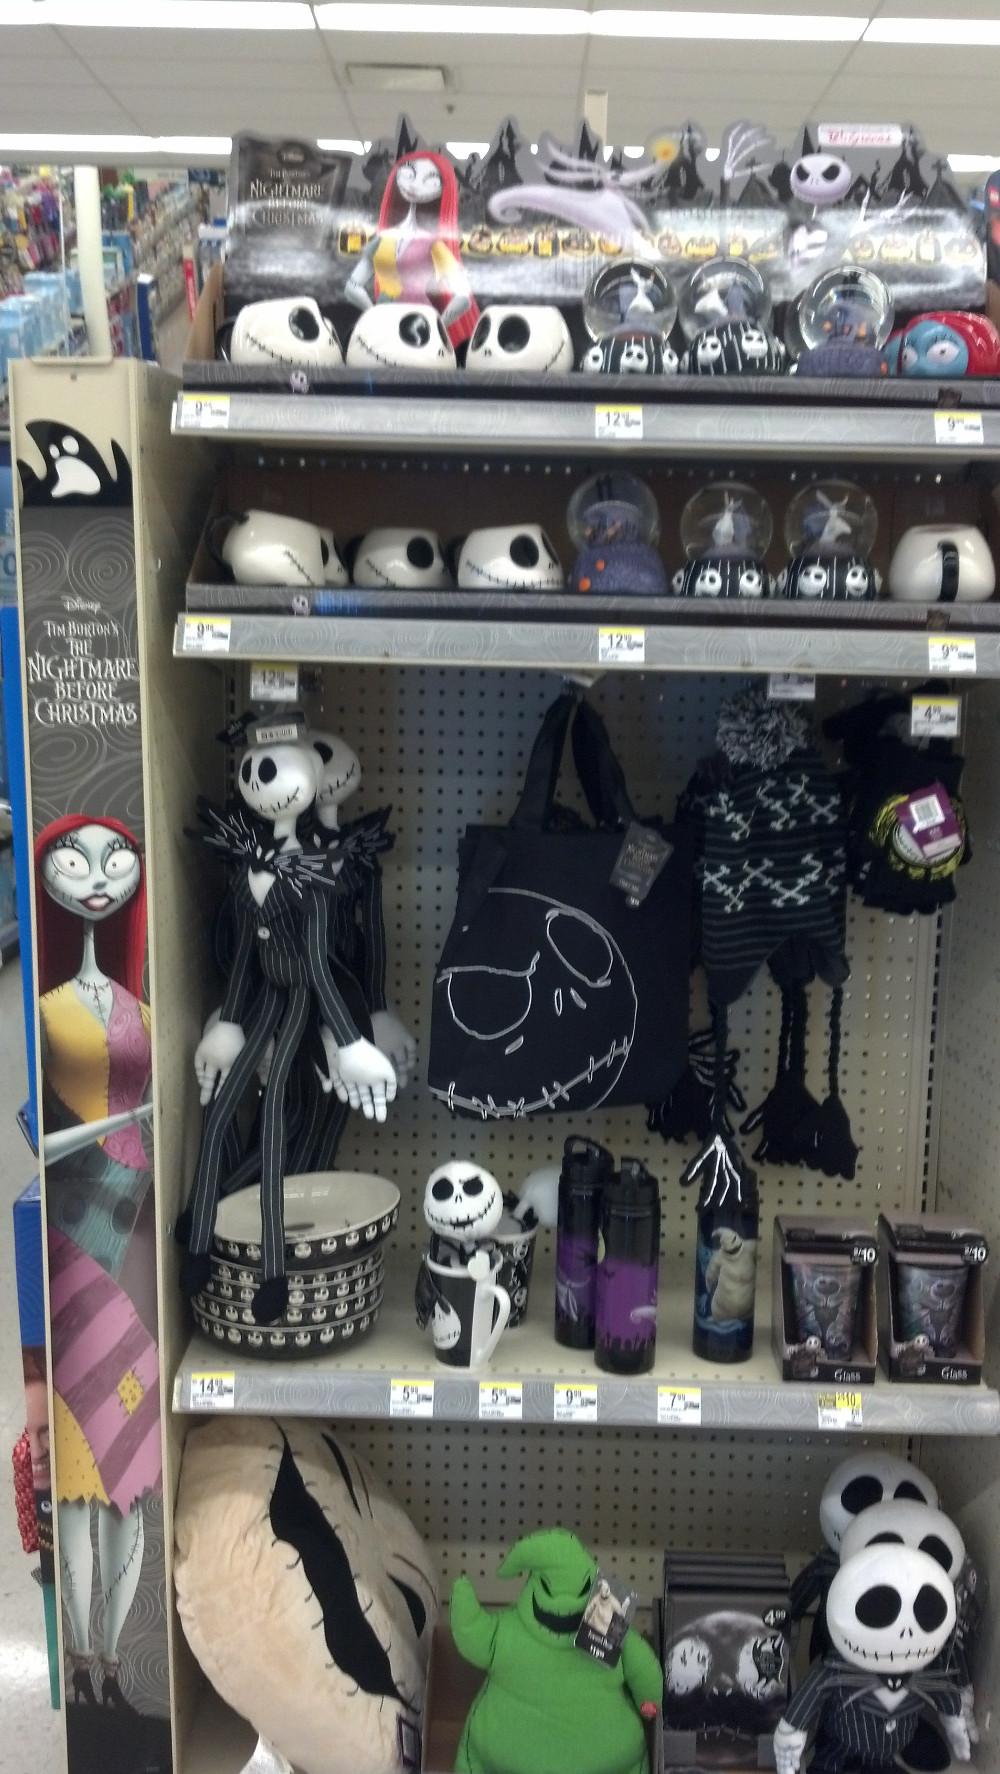 walgreens halloween nightmare before christmas decorations - Walgreens Halloween Decorations